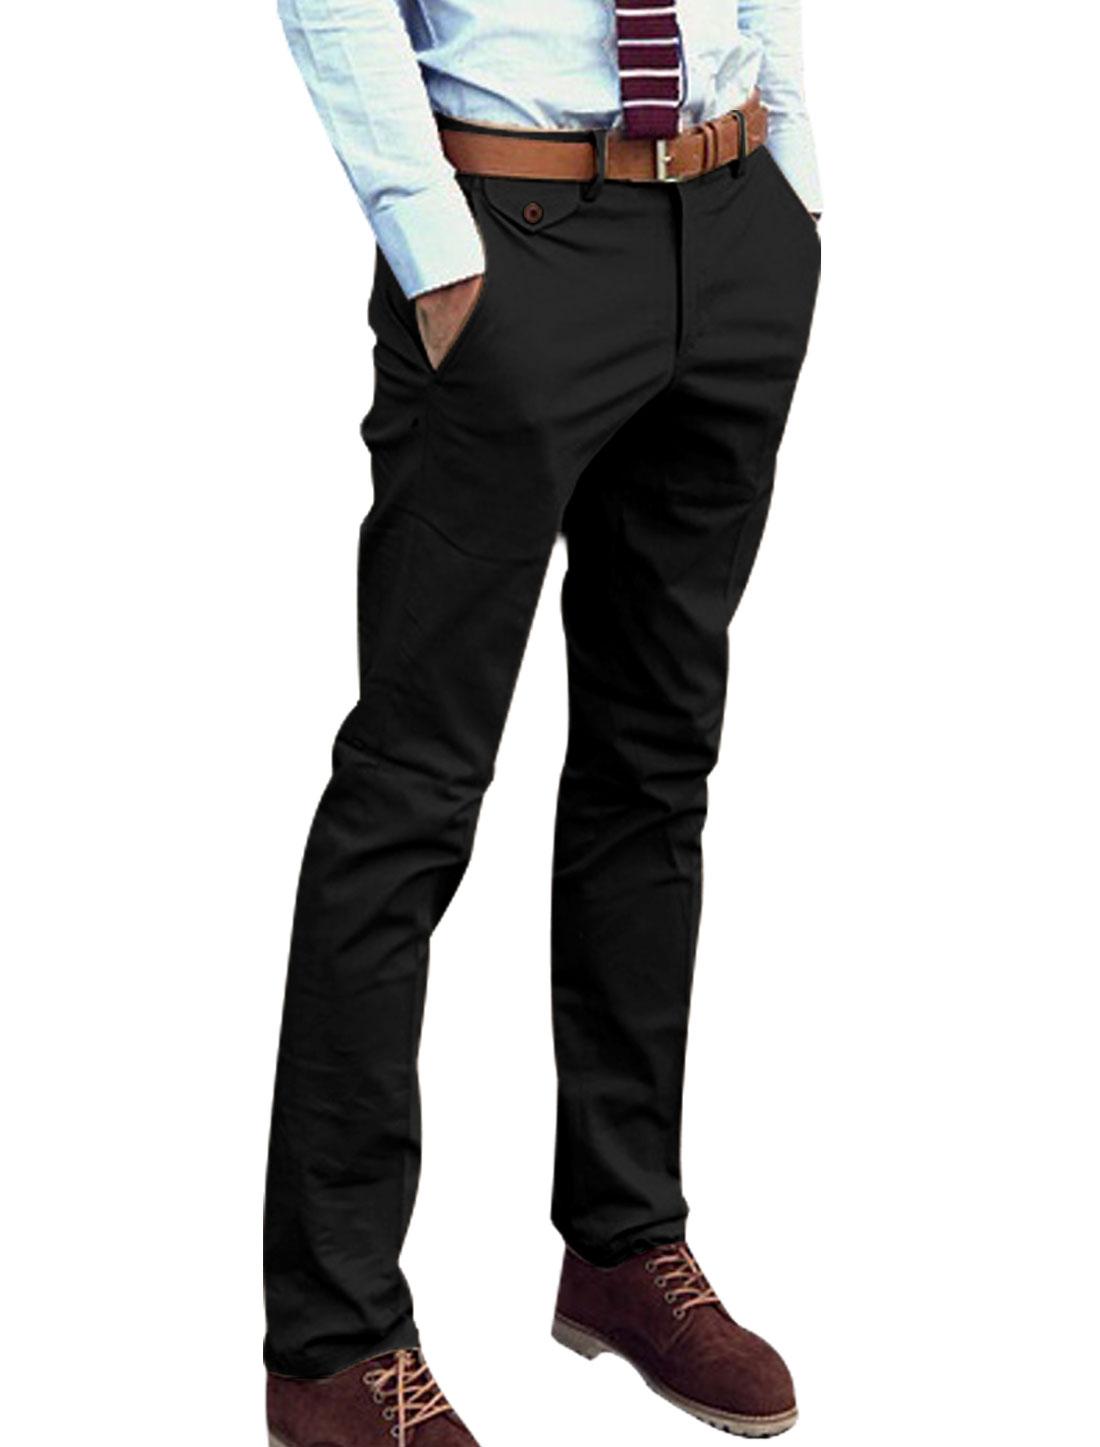 Man's Zip Fly Slant Front Pockets Belt Loop Casual Pants Black W30